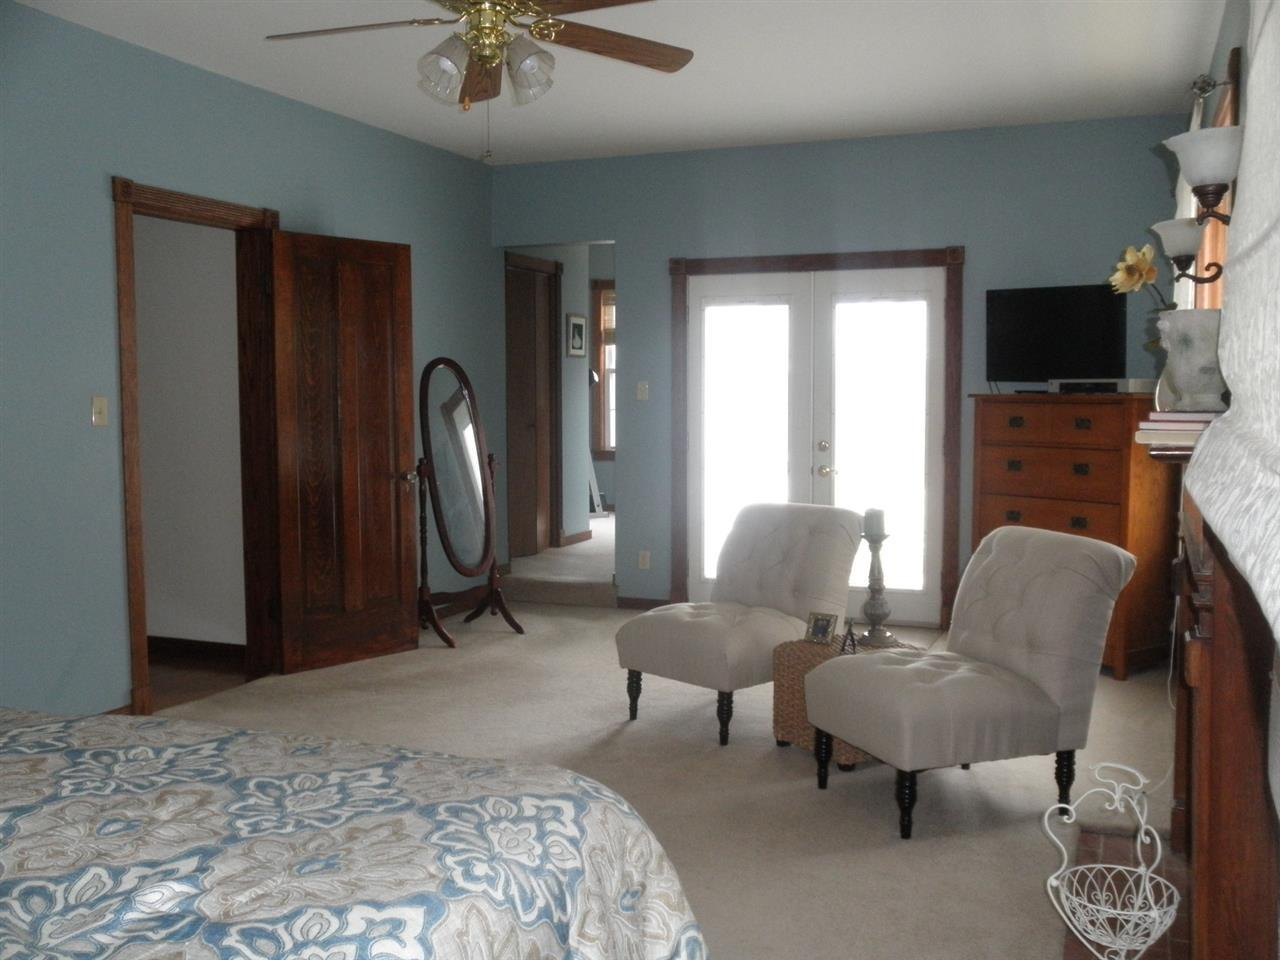 Sold Intraoffice W/MLS | 121 Elmwood Ponca City, OK 74601 28